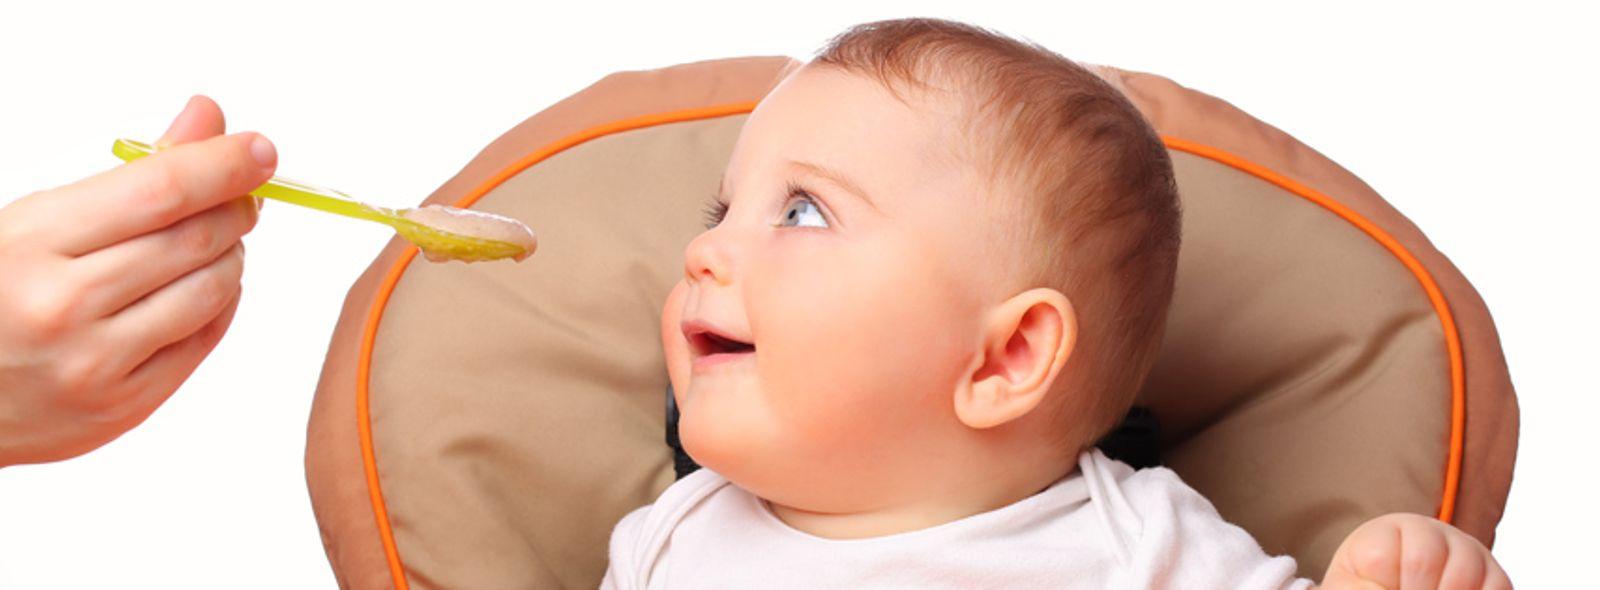 Svezzamento neonato